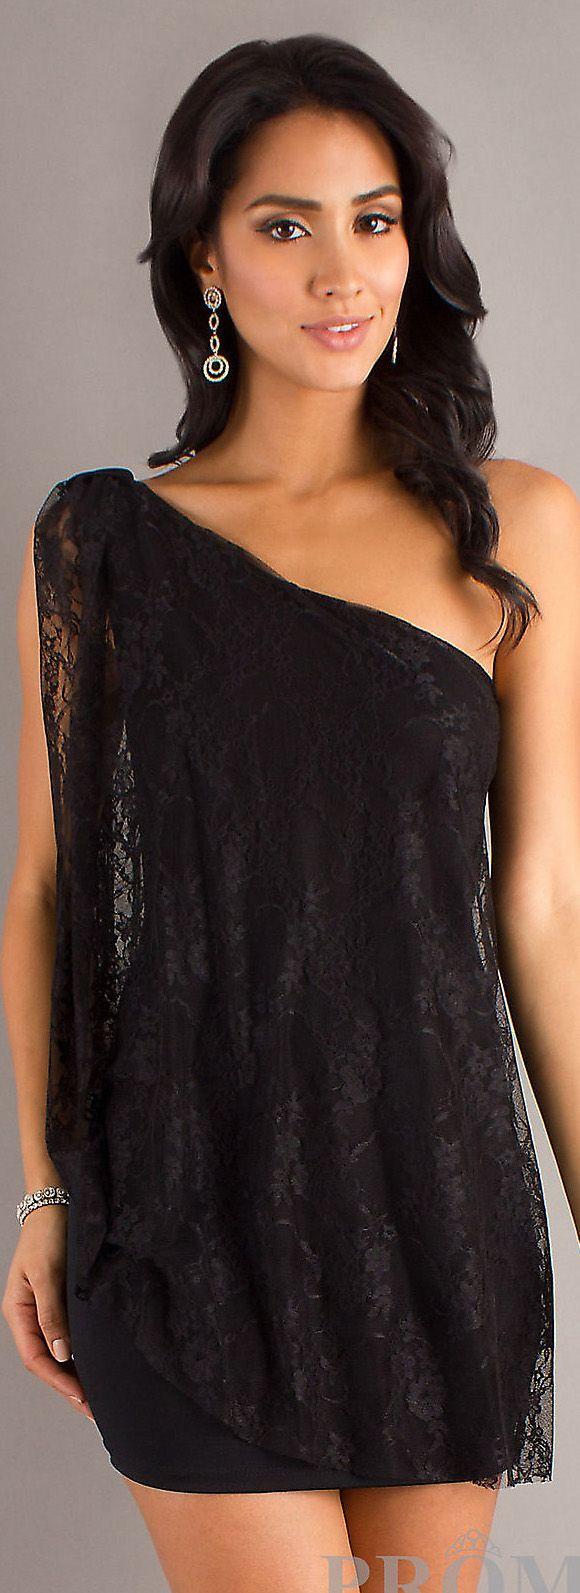 Mini Dress #oneshoulder #sexy #cocktail #dresses #lace #black